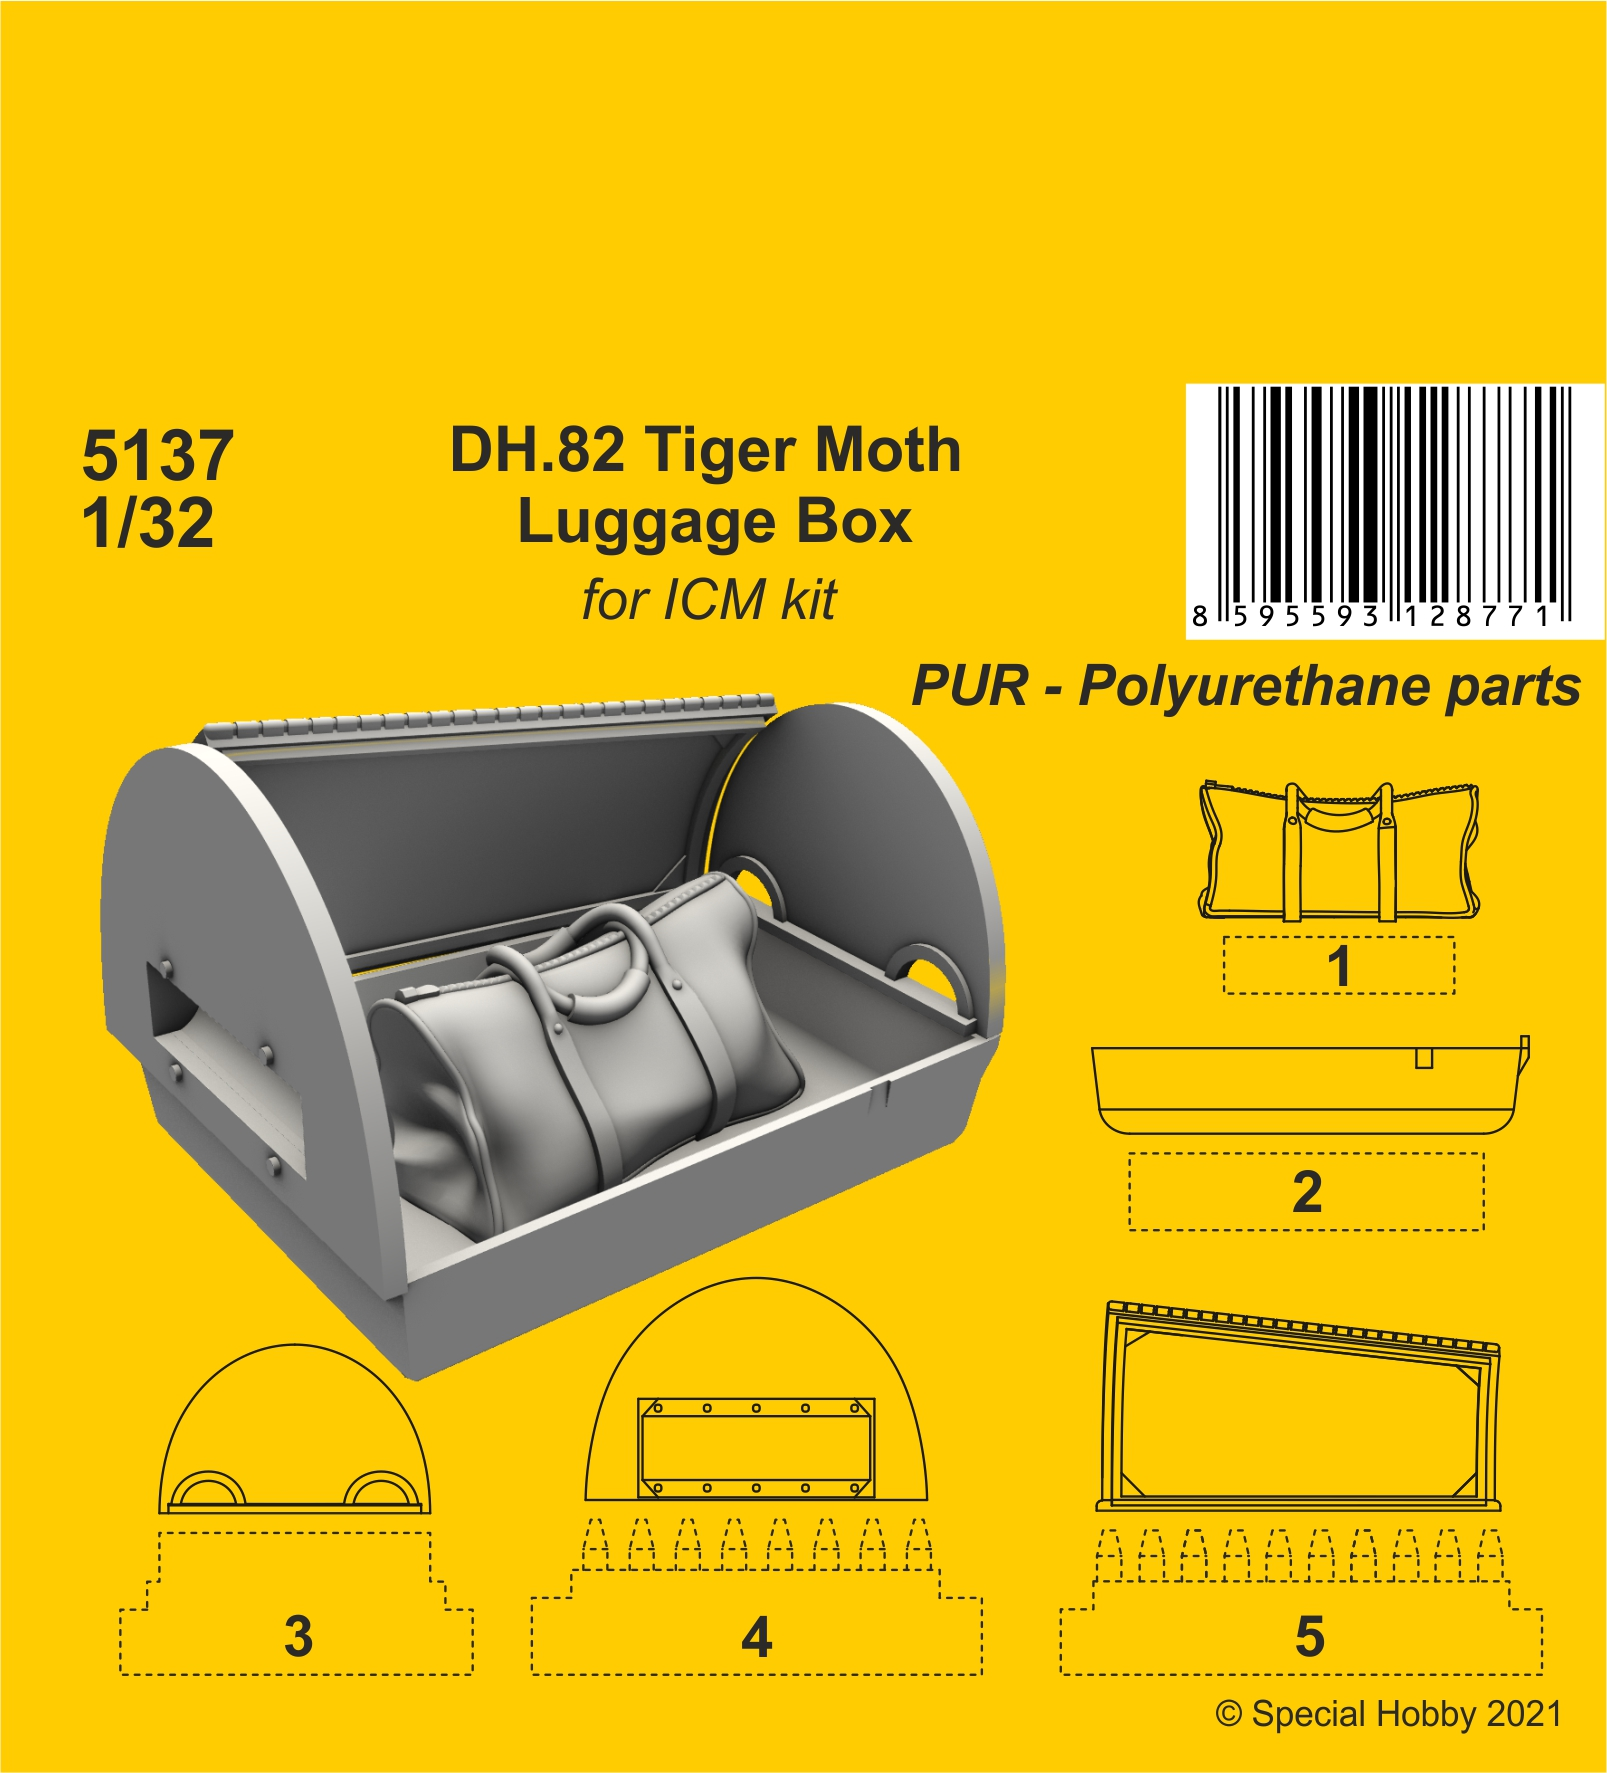 CMK 1/32 DH.82 Tiger Moth Luggage Box (ICM kit)